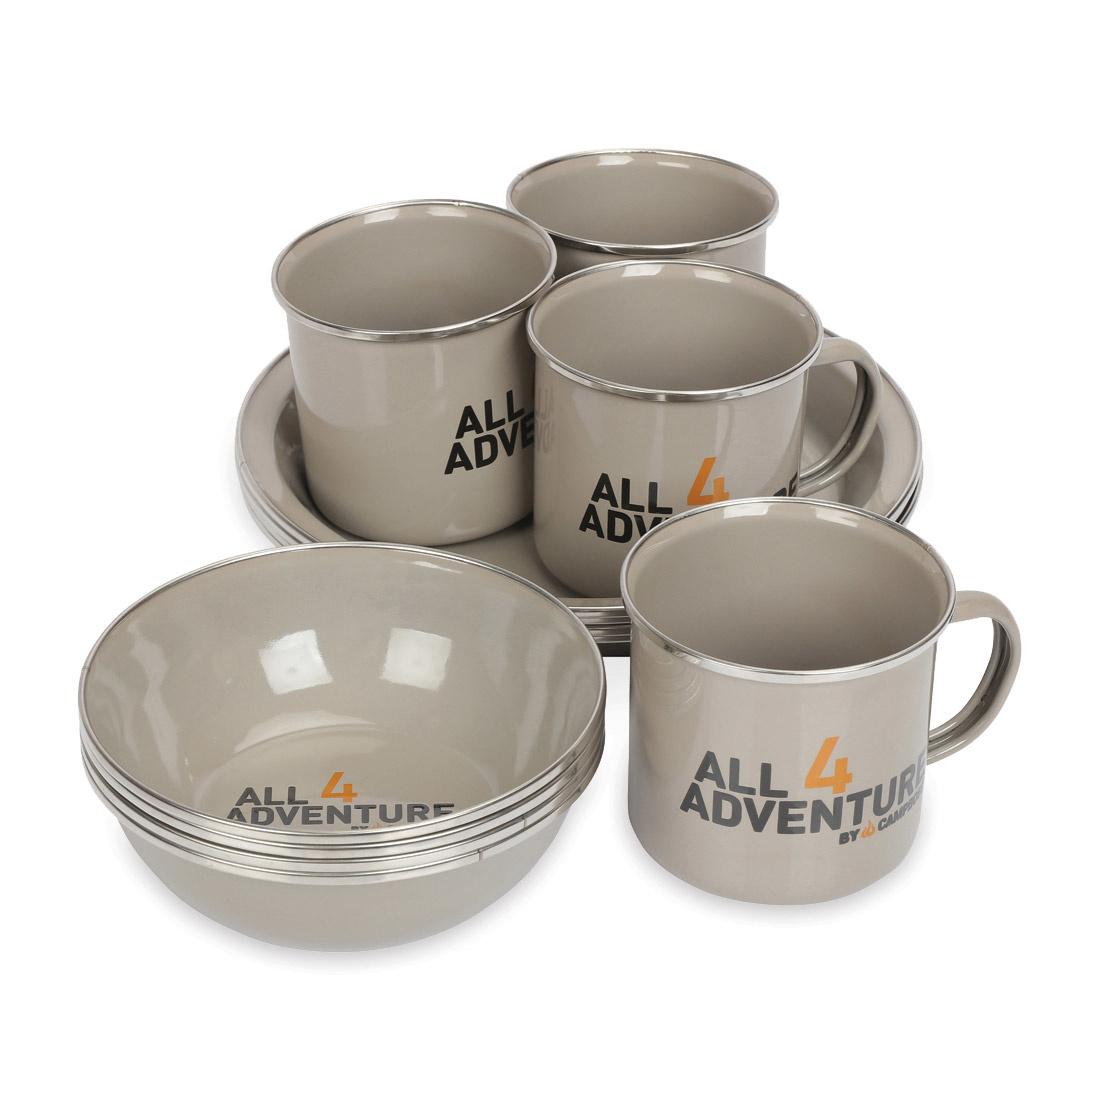 All4Adventure Emaille dinerset (12 stuks)